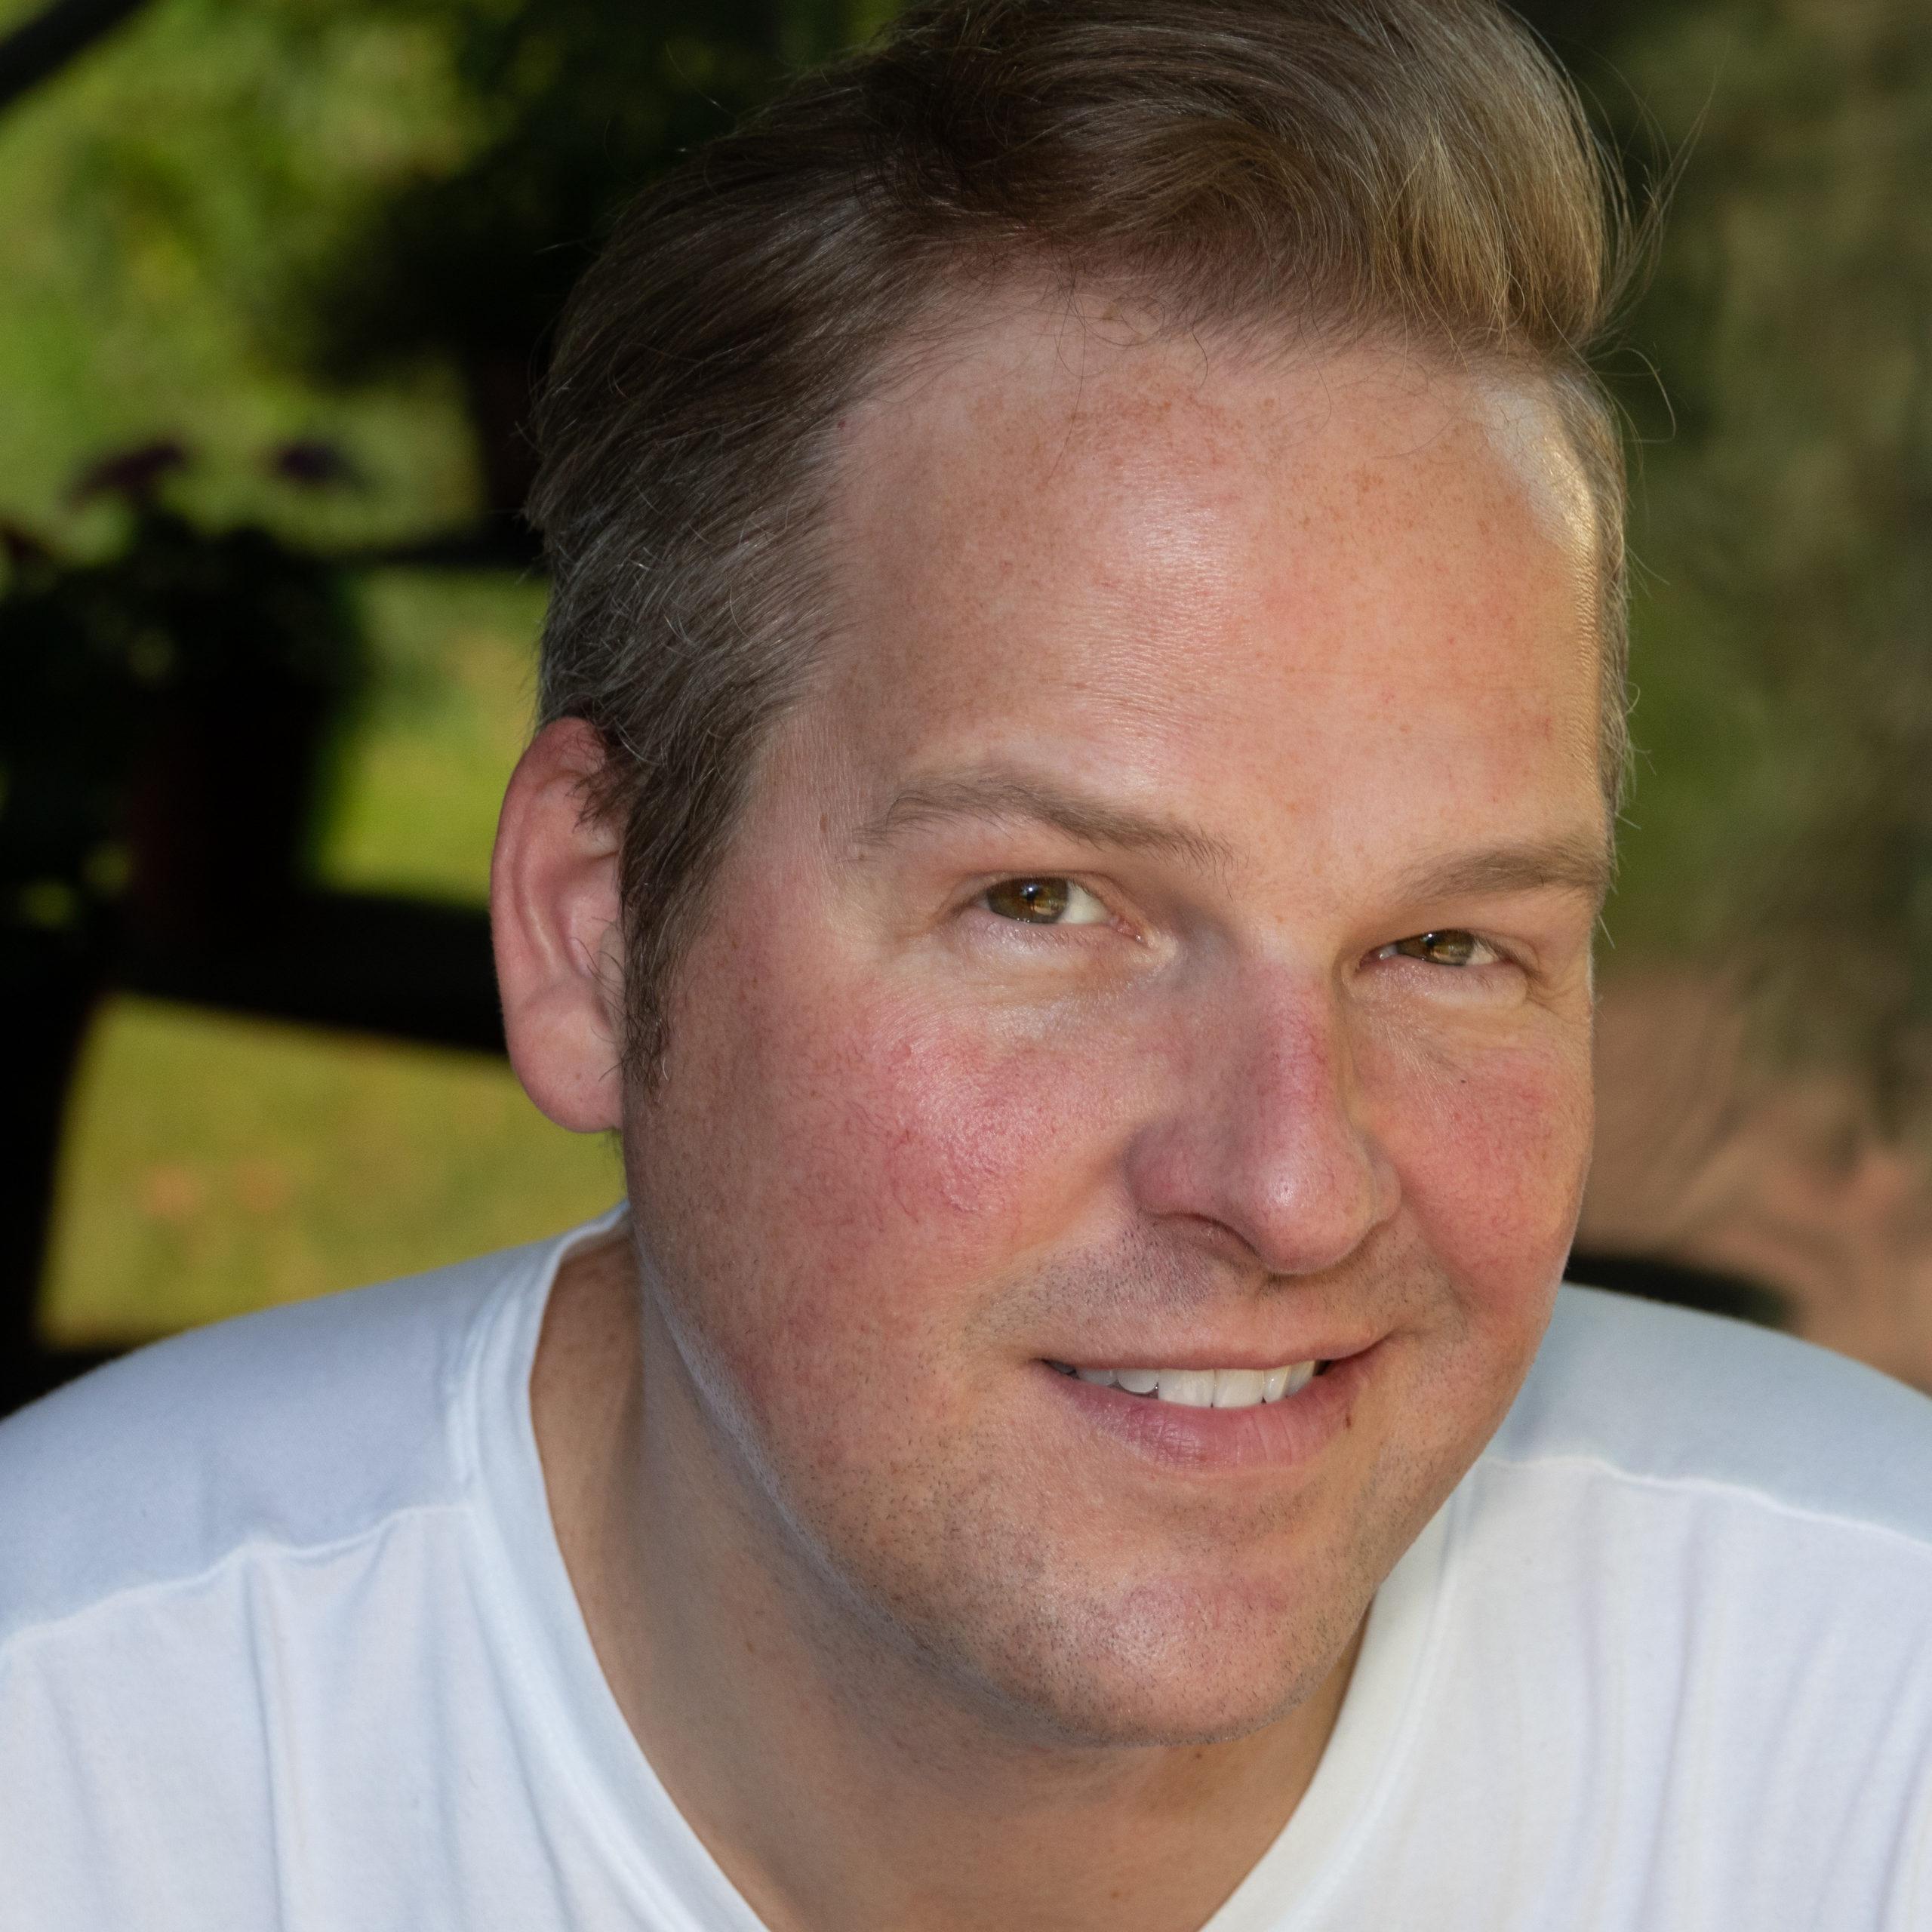 Tim Petrites